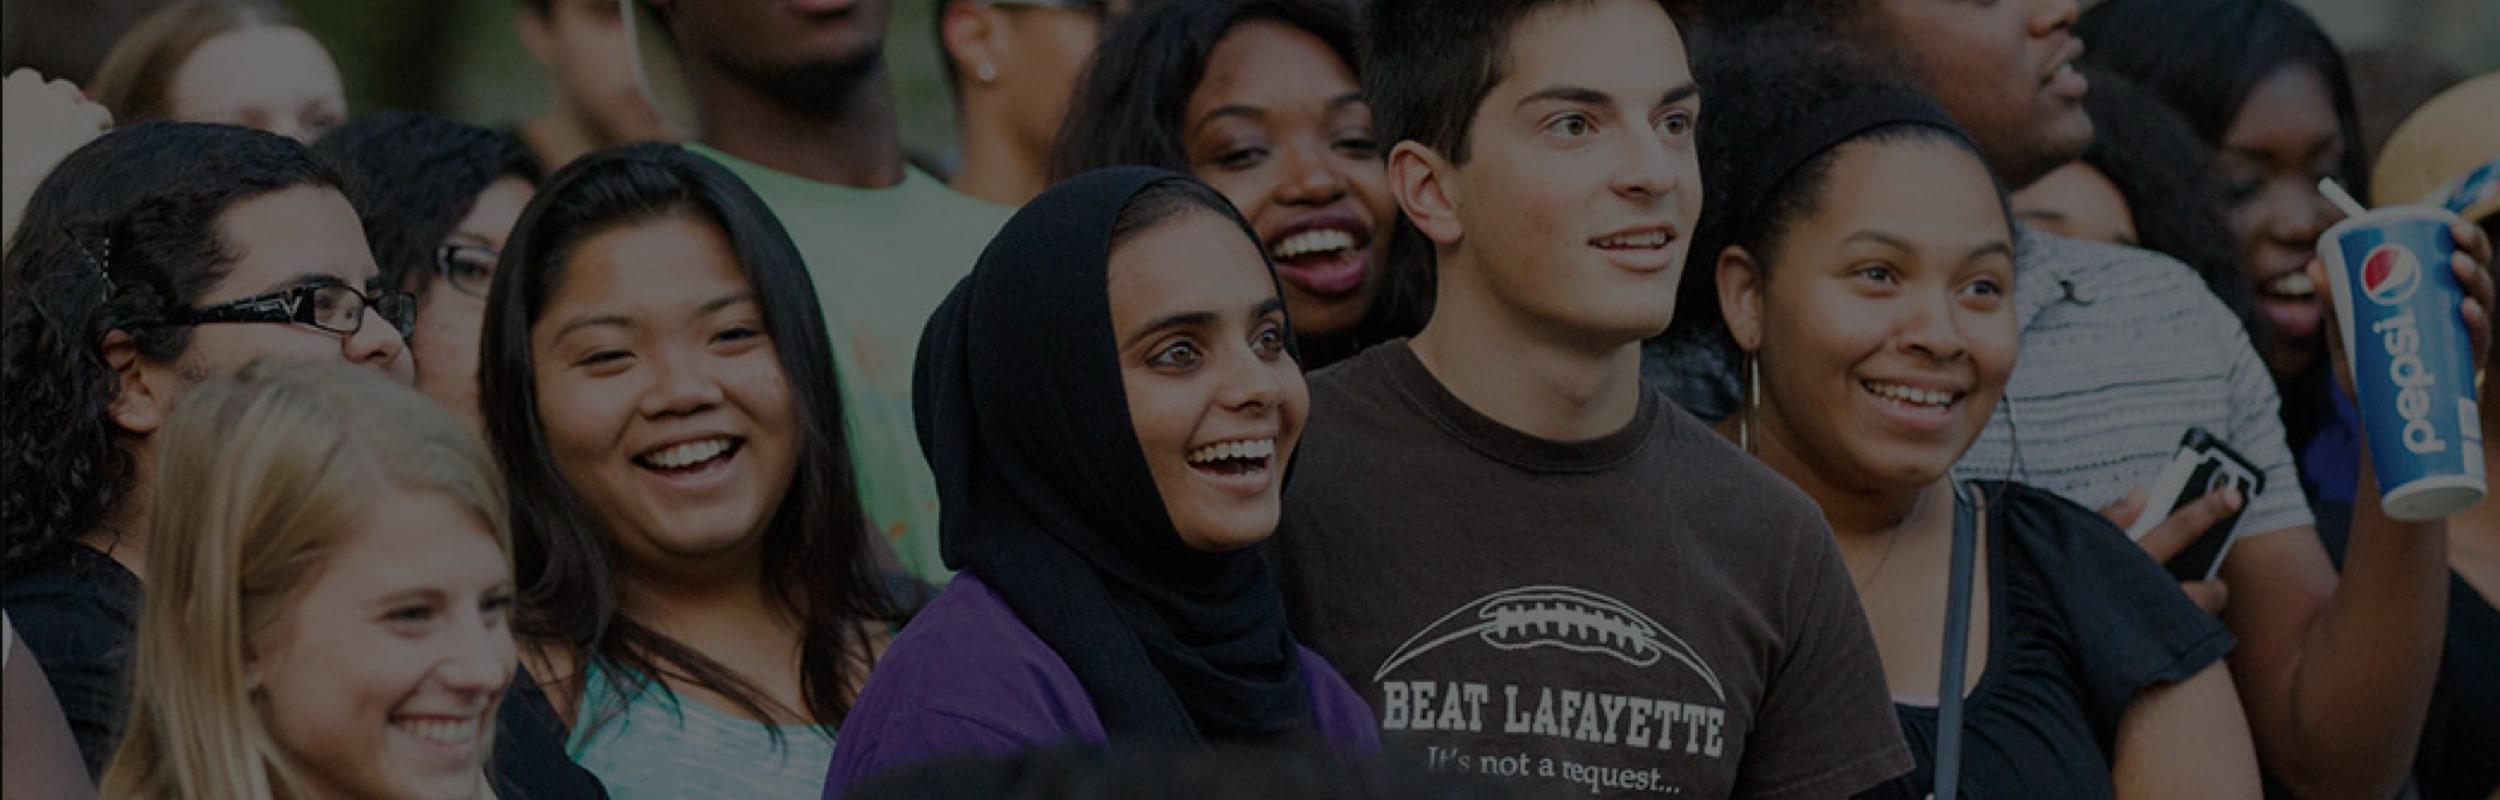 diversity banner